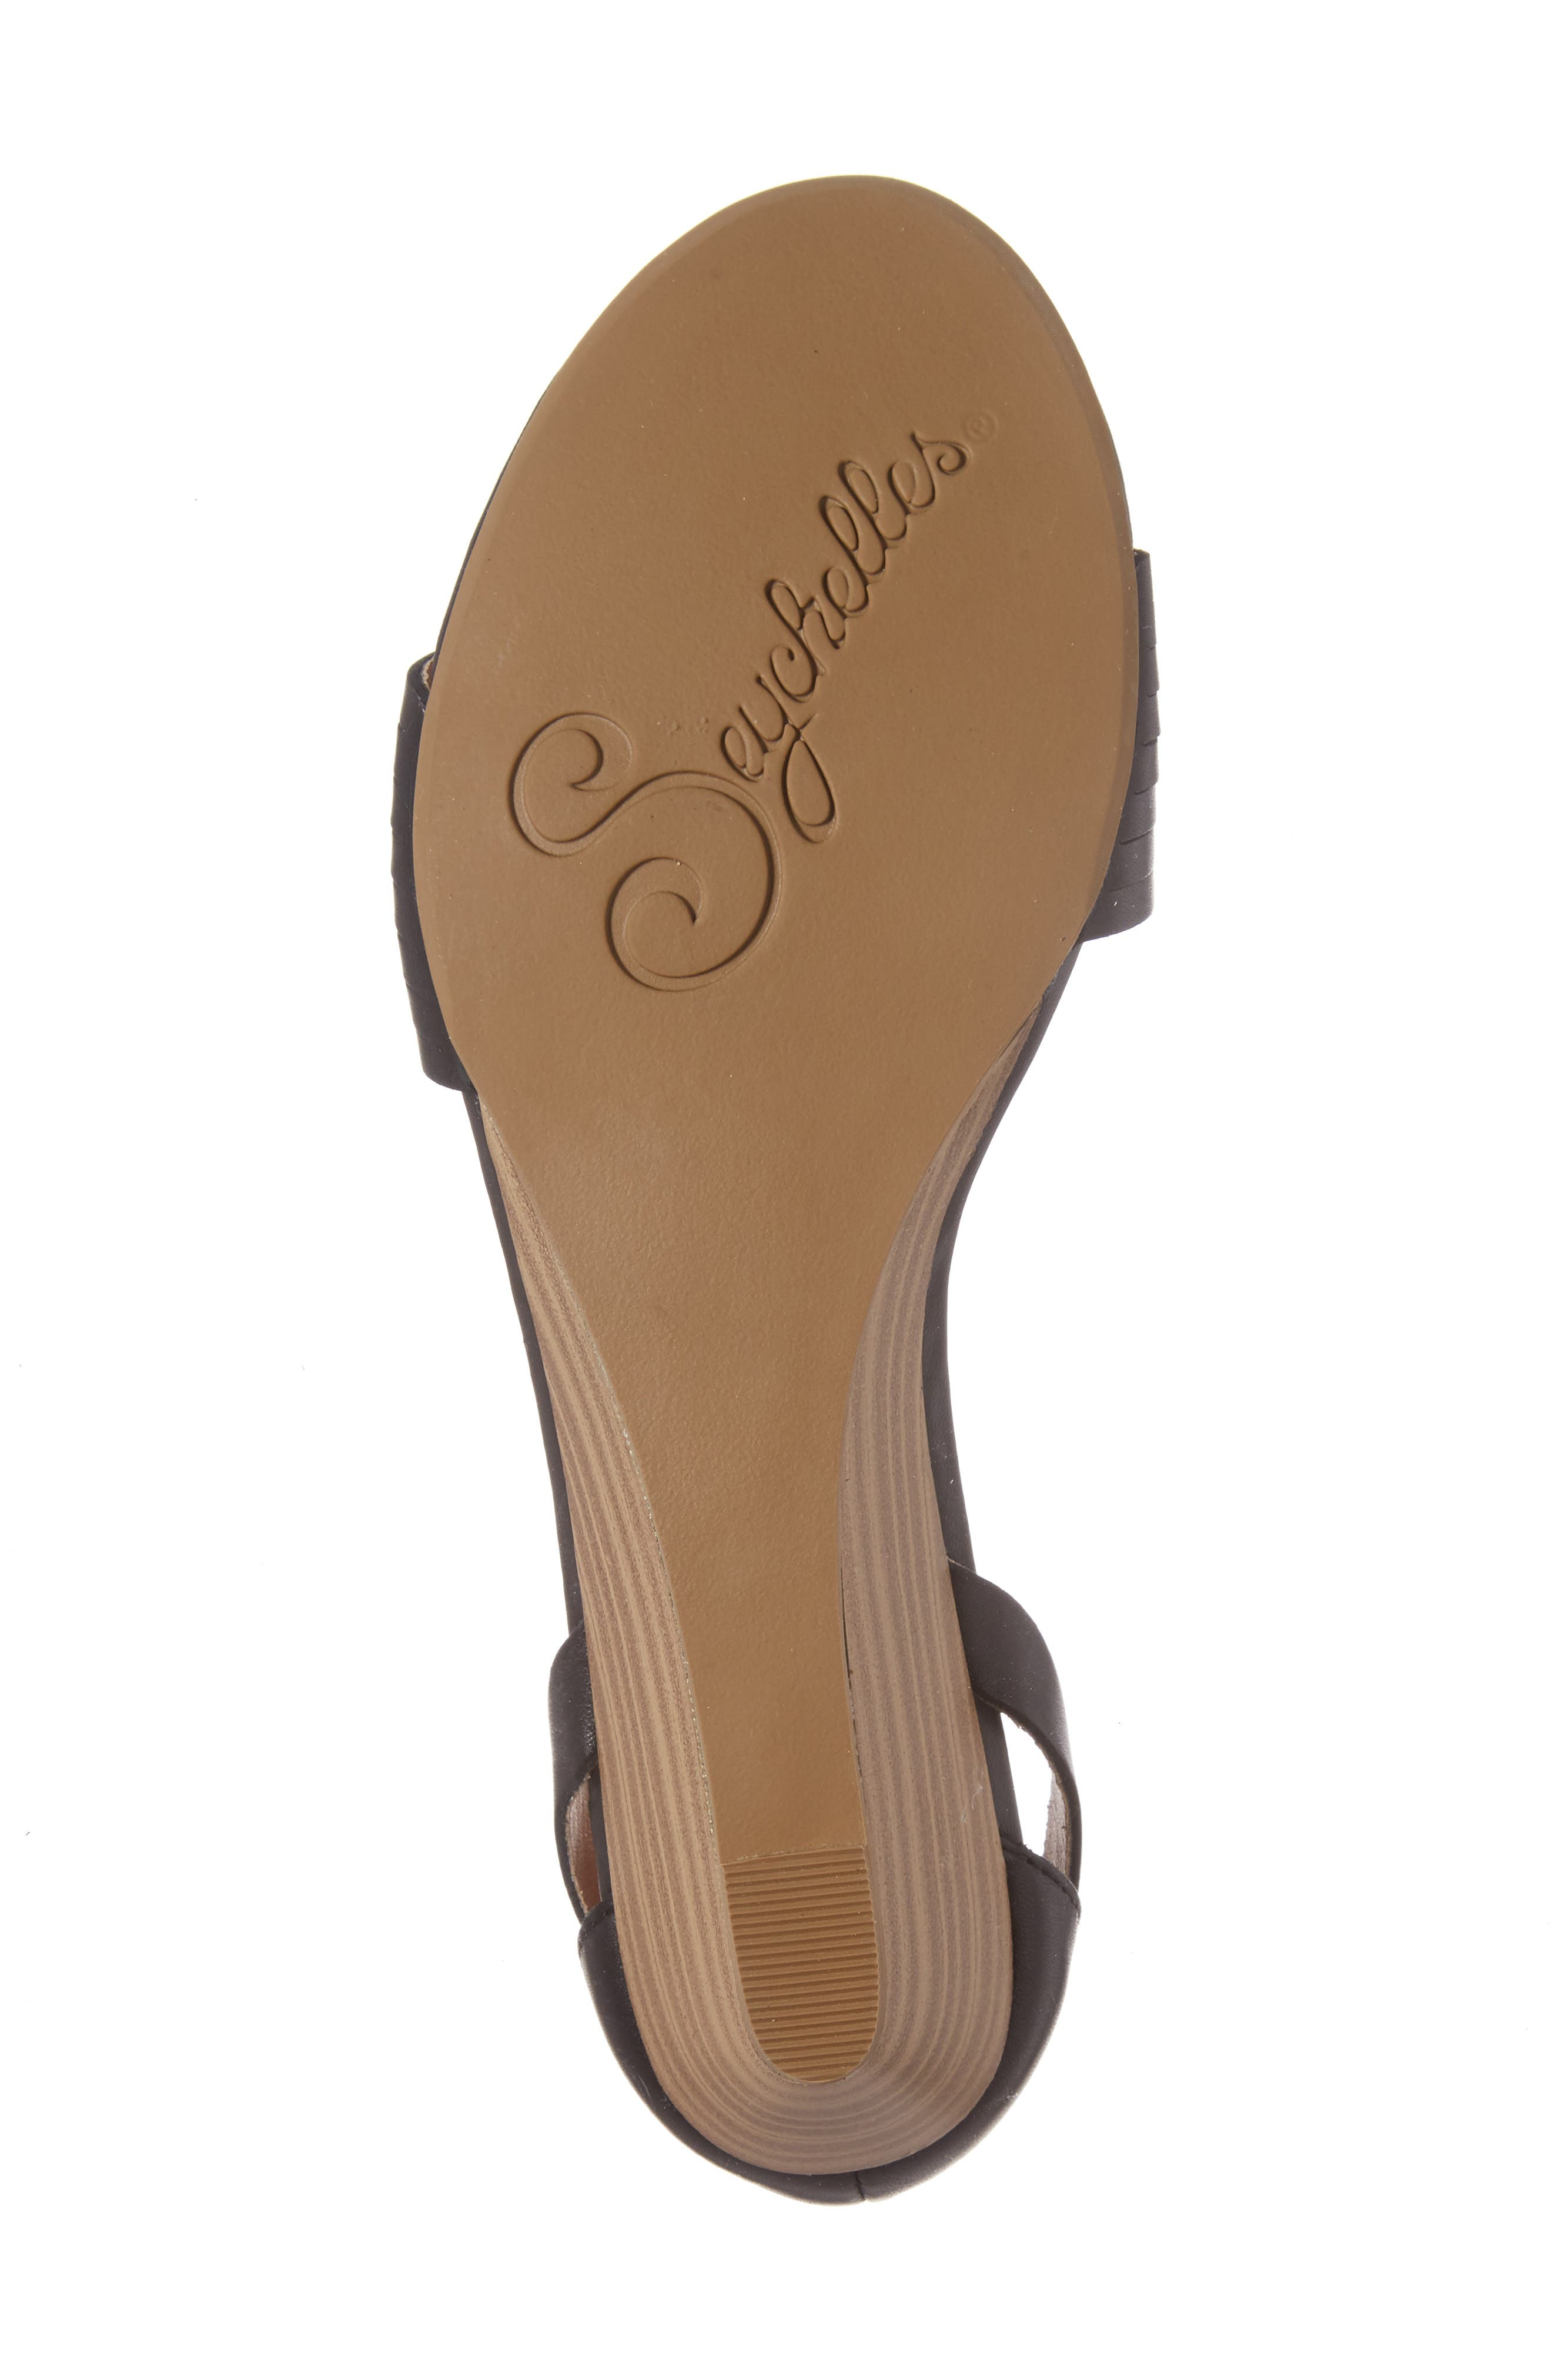 Sincere Wraparound Wedge Sandal,                             Alternate thumbnail 6, color,                             001